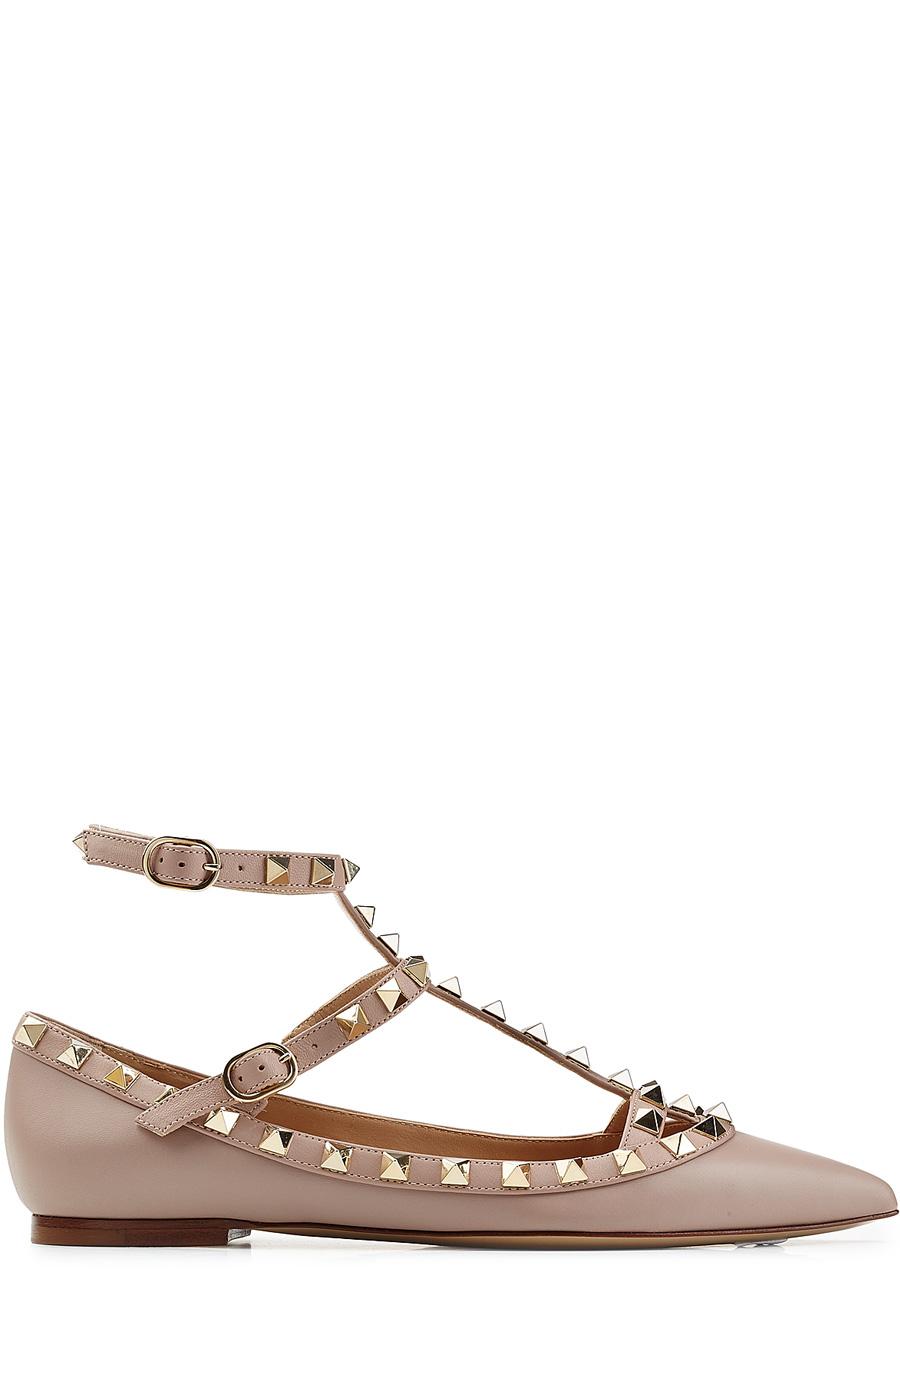 Valentino Ballerinas Rockstud Leather Flats